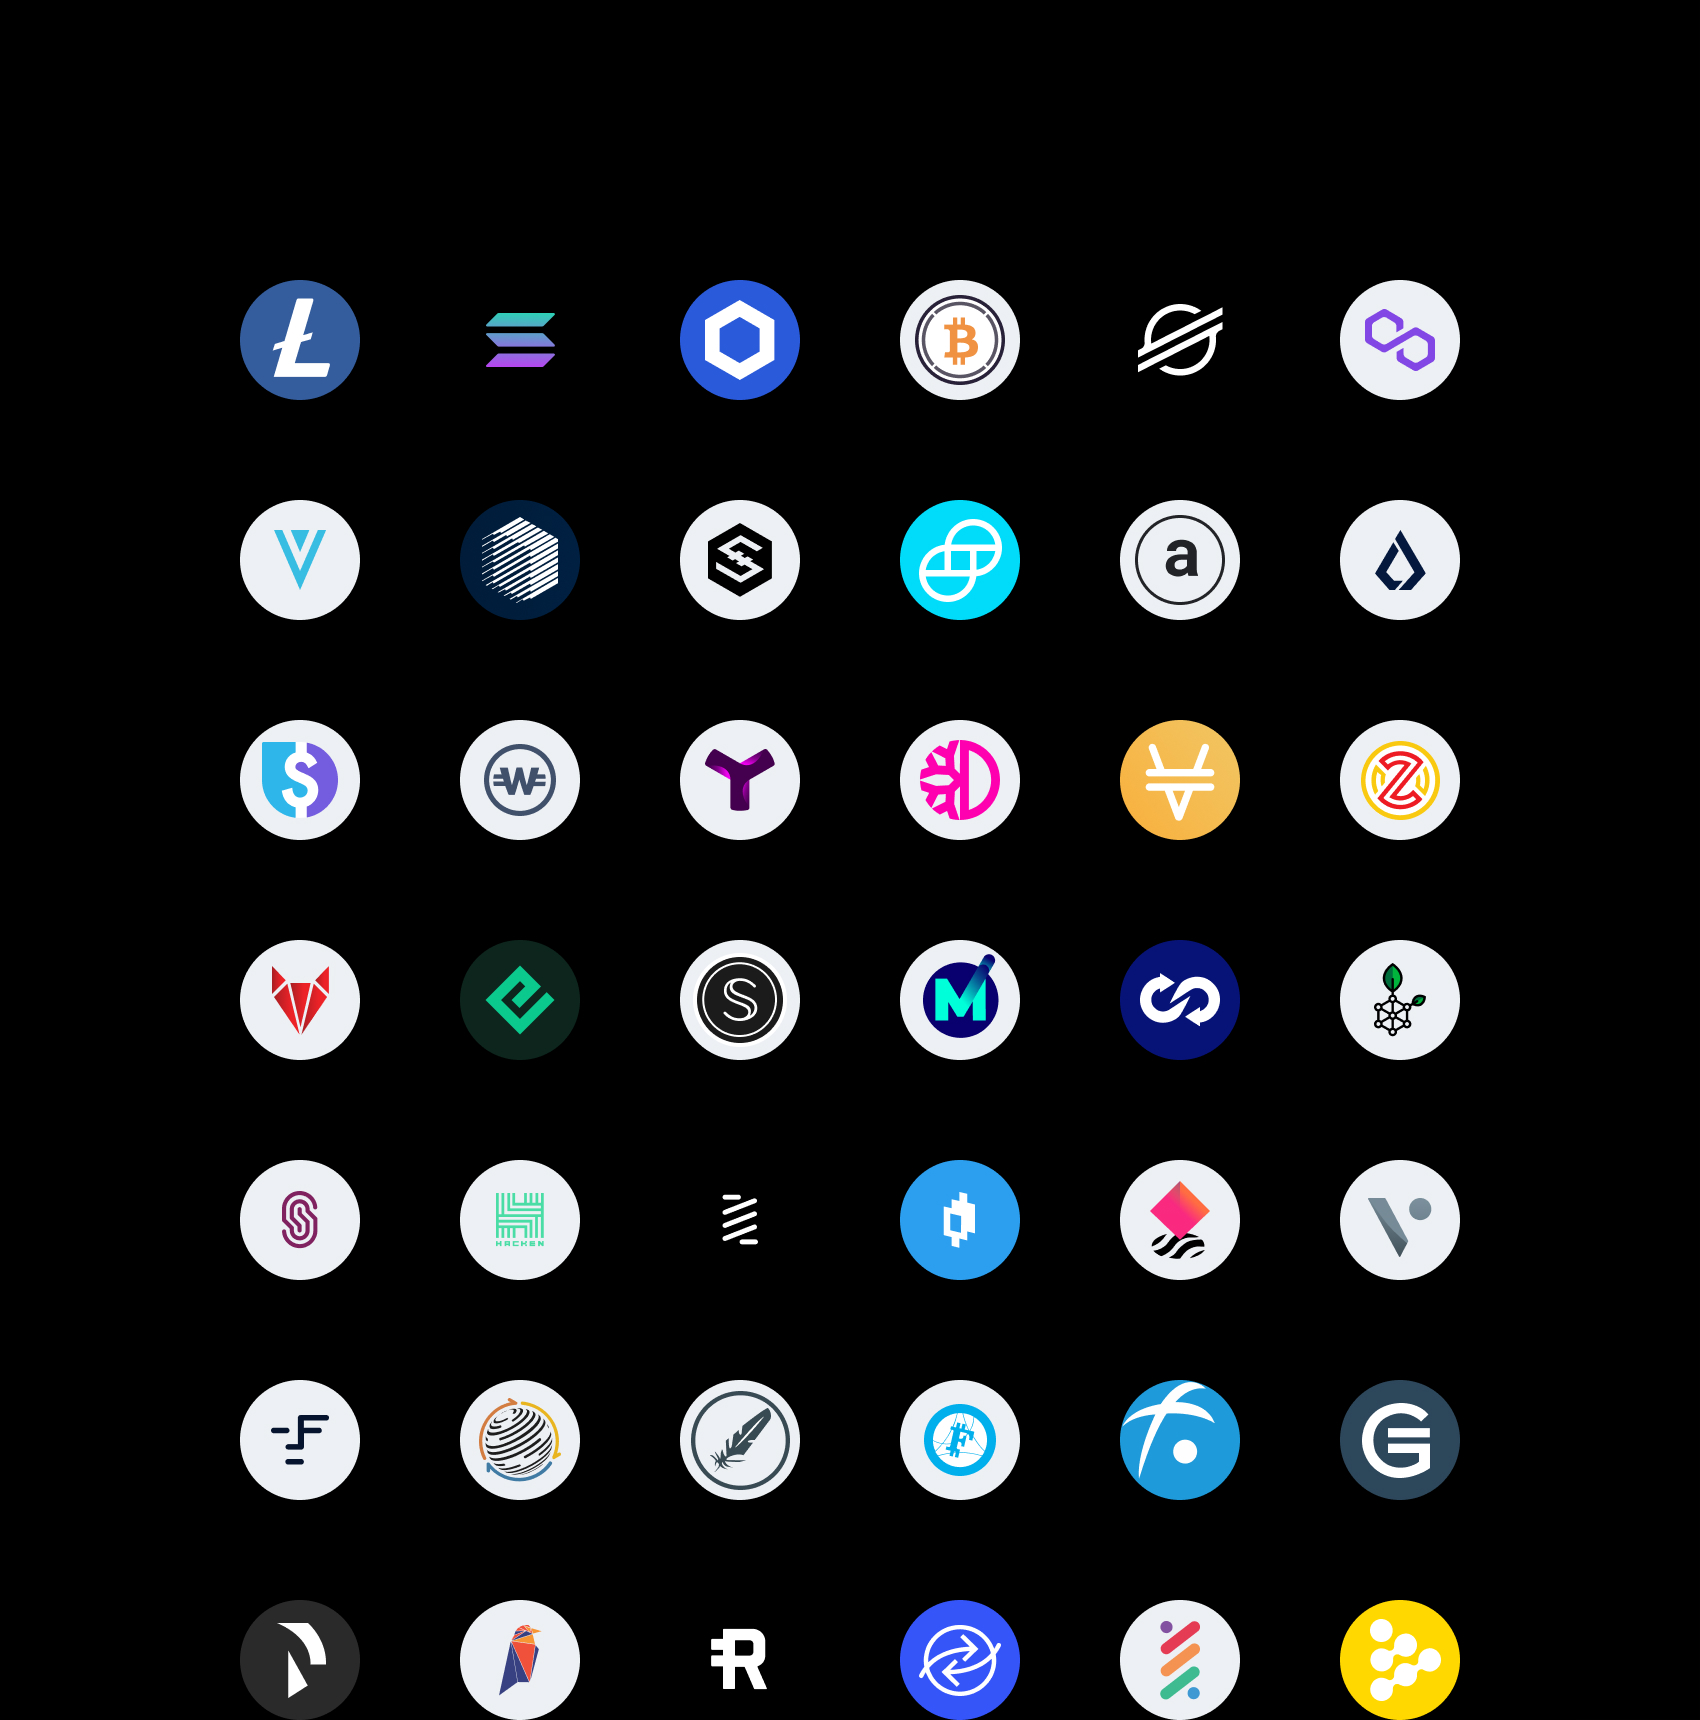 Litecoin (LTC), Solana (SOL), Chainlink (LNK), Wrapped Bitcoin (WBTC), Stellar (XLM), Polygon (MAtic), Verge (XVG), Ren (REN), IOST, Gemini Dollar (GUSD), Arweave (AR), List (LSK), Liquide USD (LUSD), WhiteCoin (XWC), Symbol (XYM), DeFiChain (DFI), Venus BNB (vBNB), Zelwin (ZLW), RedFOX Labs (RFOX), Energi (NRG), Secret (SCRT), MXC (MXC), TrustSwap (SWAP), RSK Smart Bitcoin (RBTC), Snyft Network (SHFT), Hacken Token (HAI), Bounce Token (AUCTION), Mirrored Apple (mAAPL), NFTX (NFTX), BLOCKv (VEE), Faceter (Face), Factom (FCT), Feathercoin (Ftc), Fujicoin (Fjc), Gamecredits (Game), Raiden Network Token (RDN), Ravecoin (Rvn), Reserve (Rev), Ripio Credit Network (Rcn), Rise (Rise), Ric (Ric)